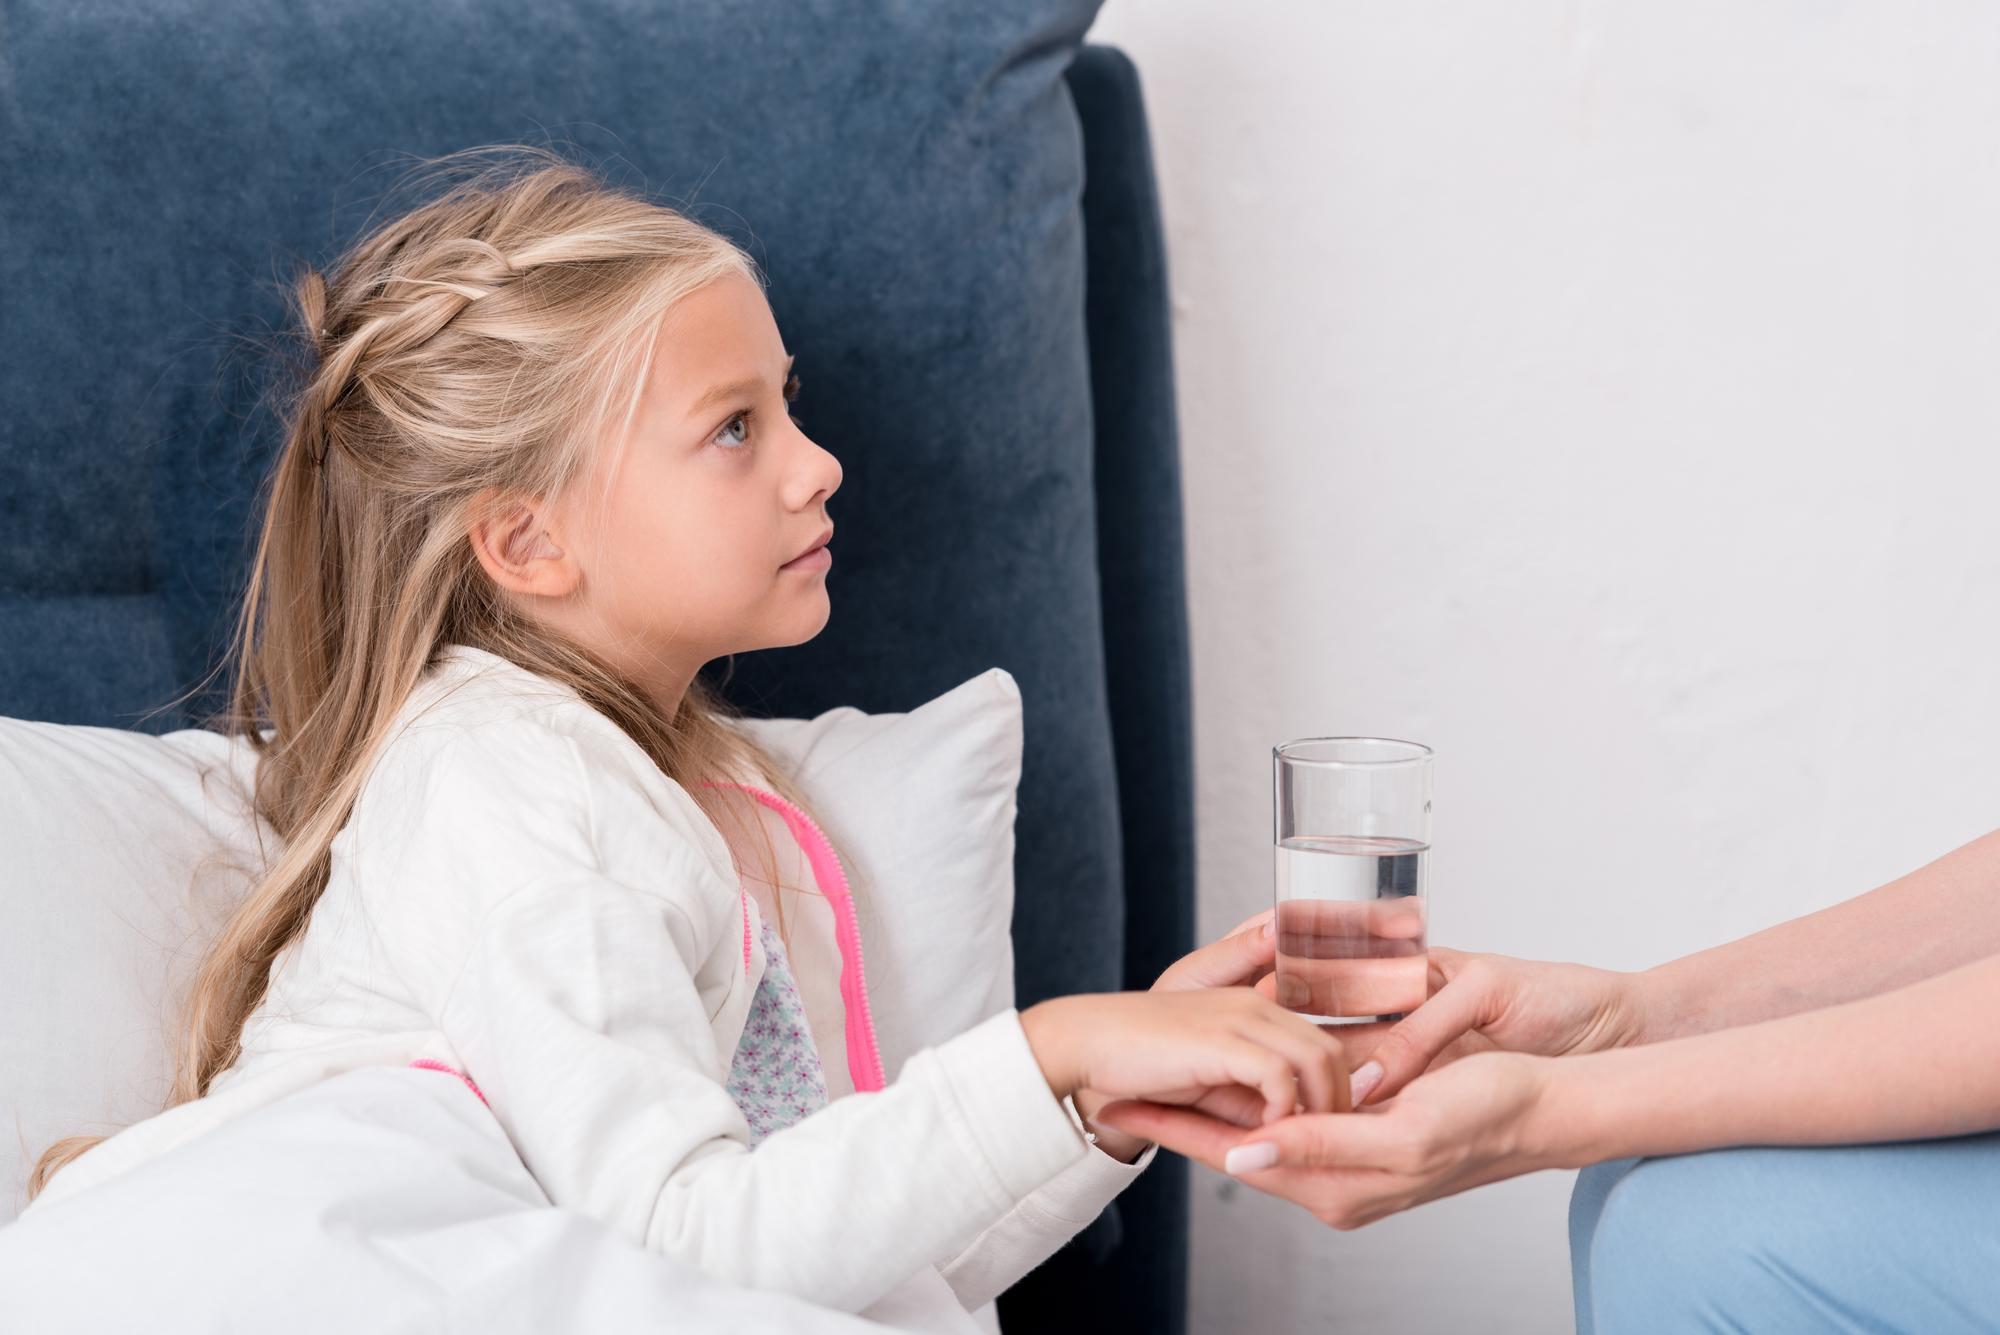 Как лечить герпес у ребенка